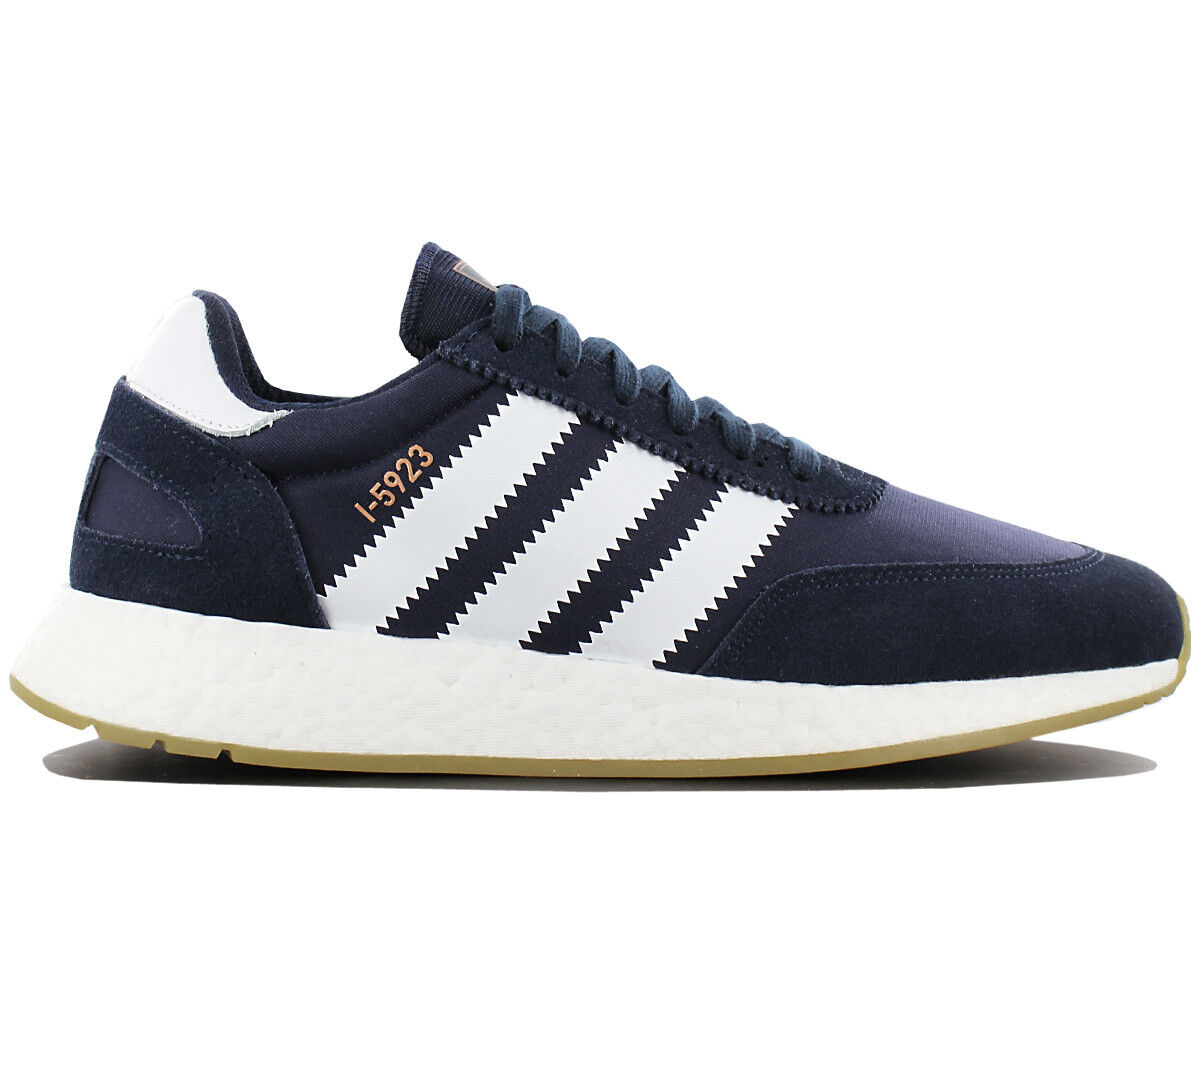 Adidas Originals Iniki I-5923 Boost Baskets Hommes Retro Chaussures BB2092